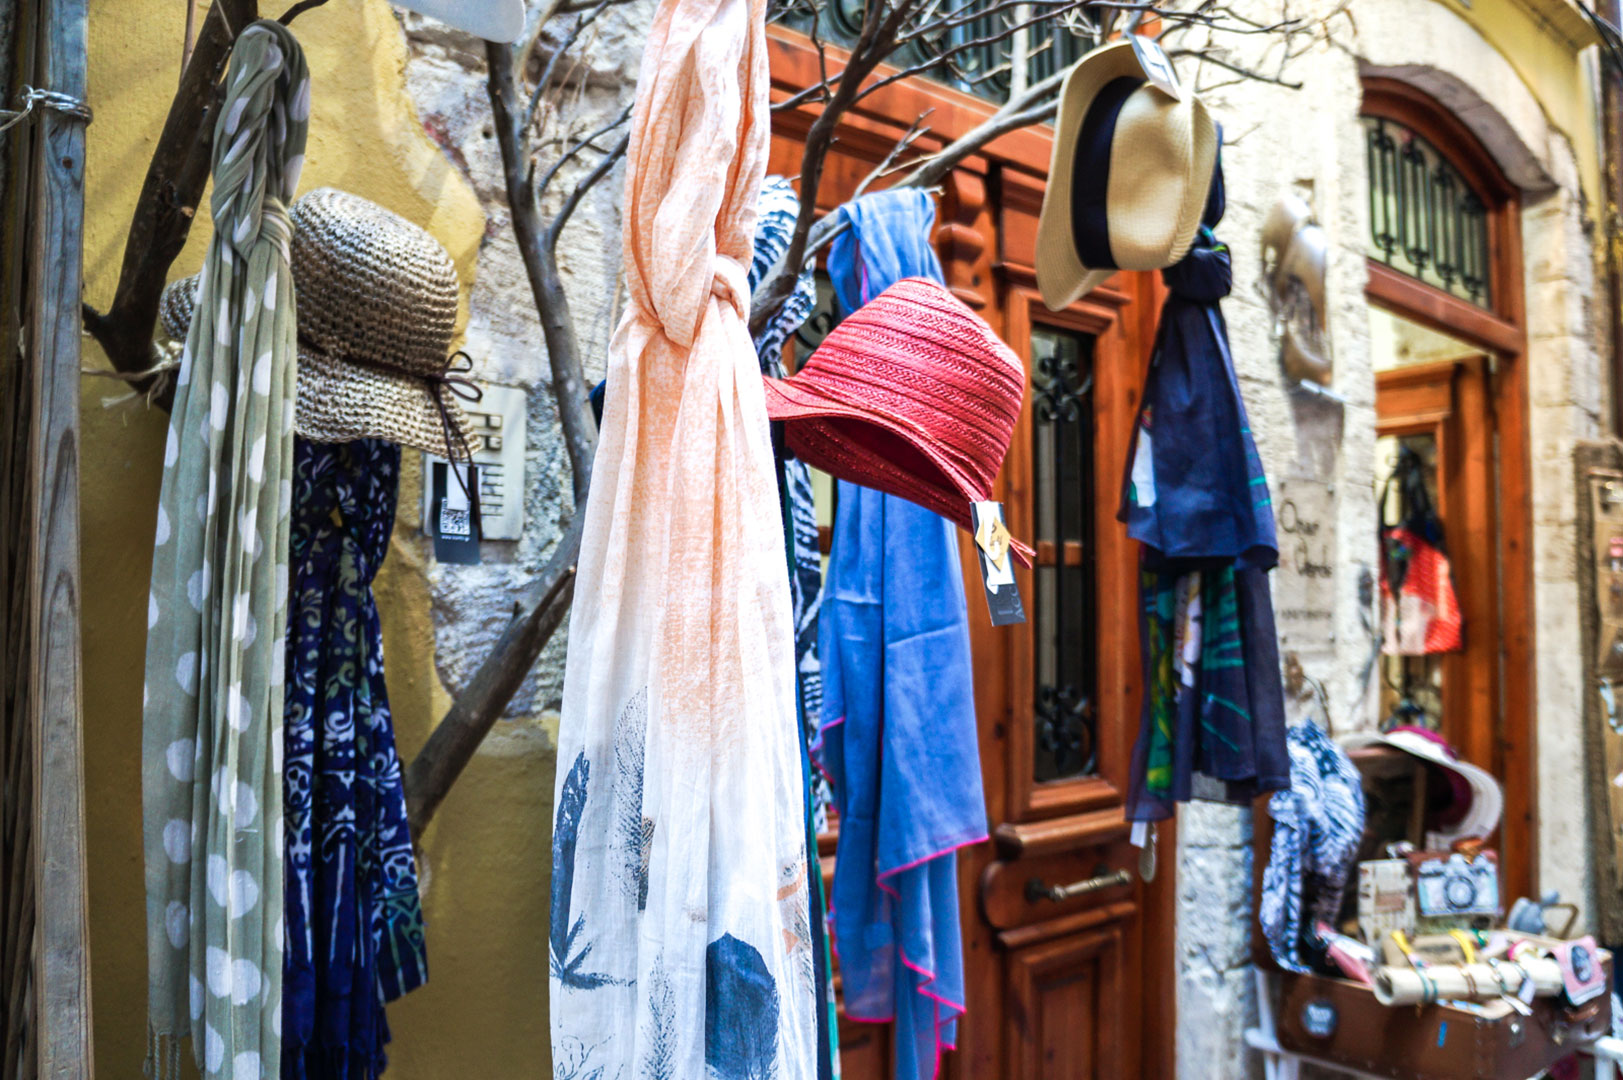 chania-crete-greece-la-vie-en-blog-all-rights-reserved-25